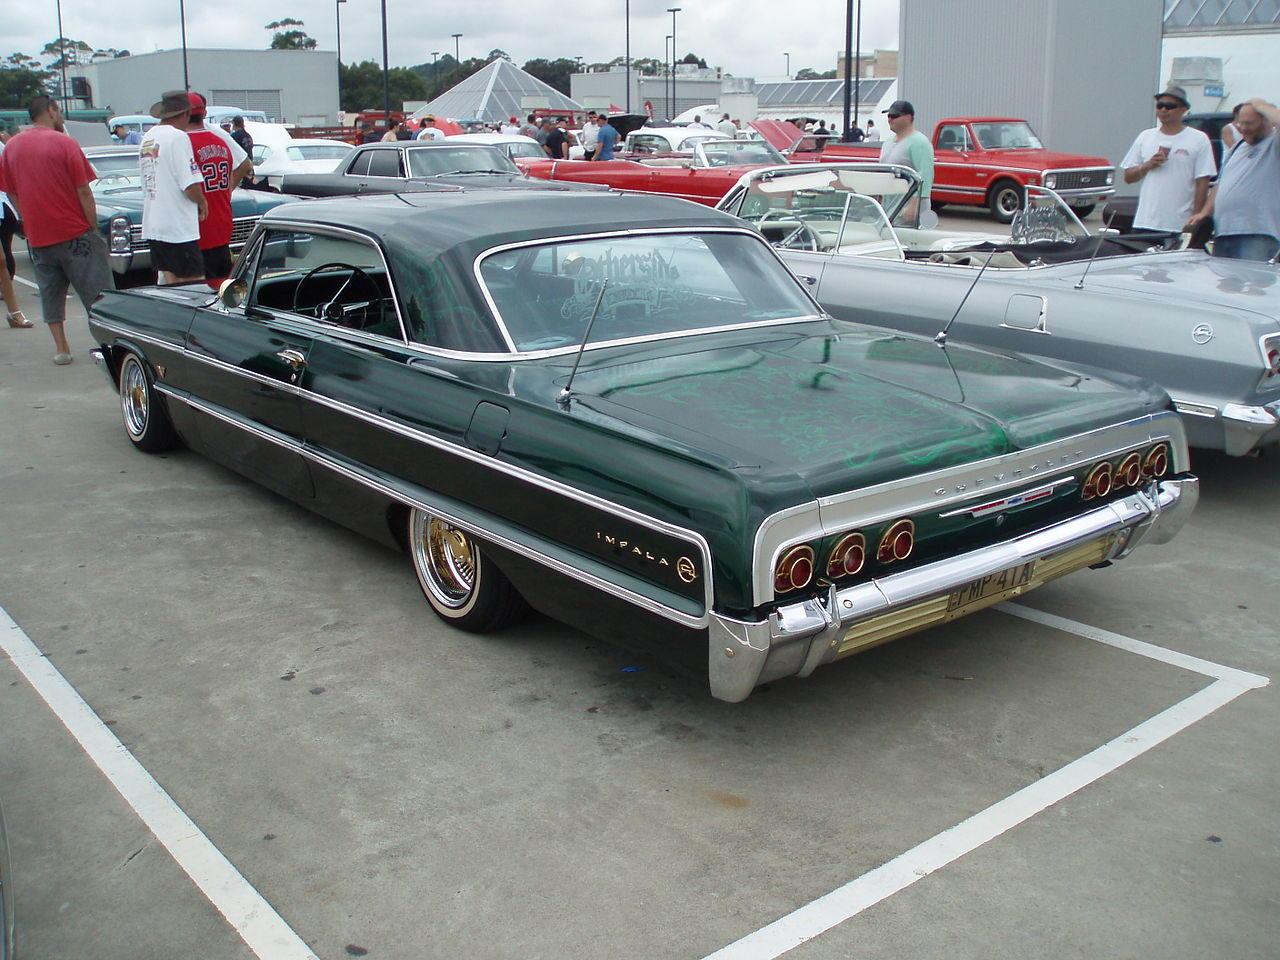 1964 Chevy Impala Lowrider [1280 x 960]